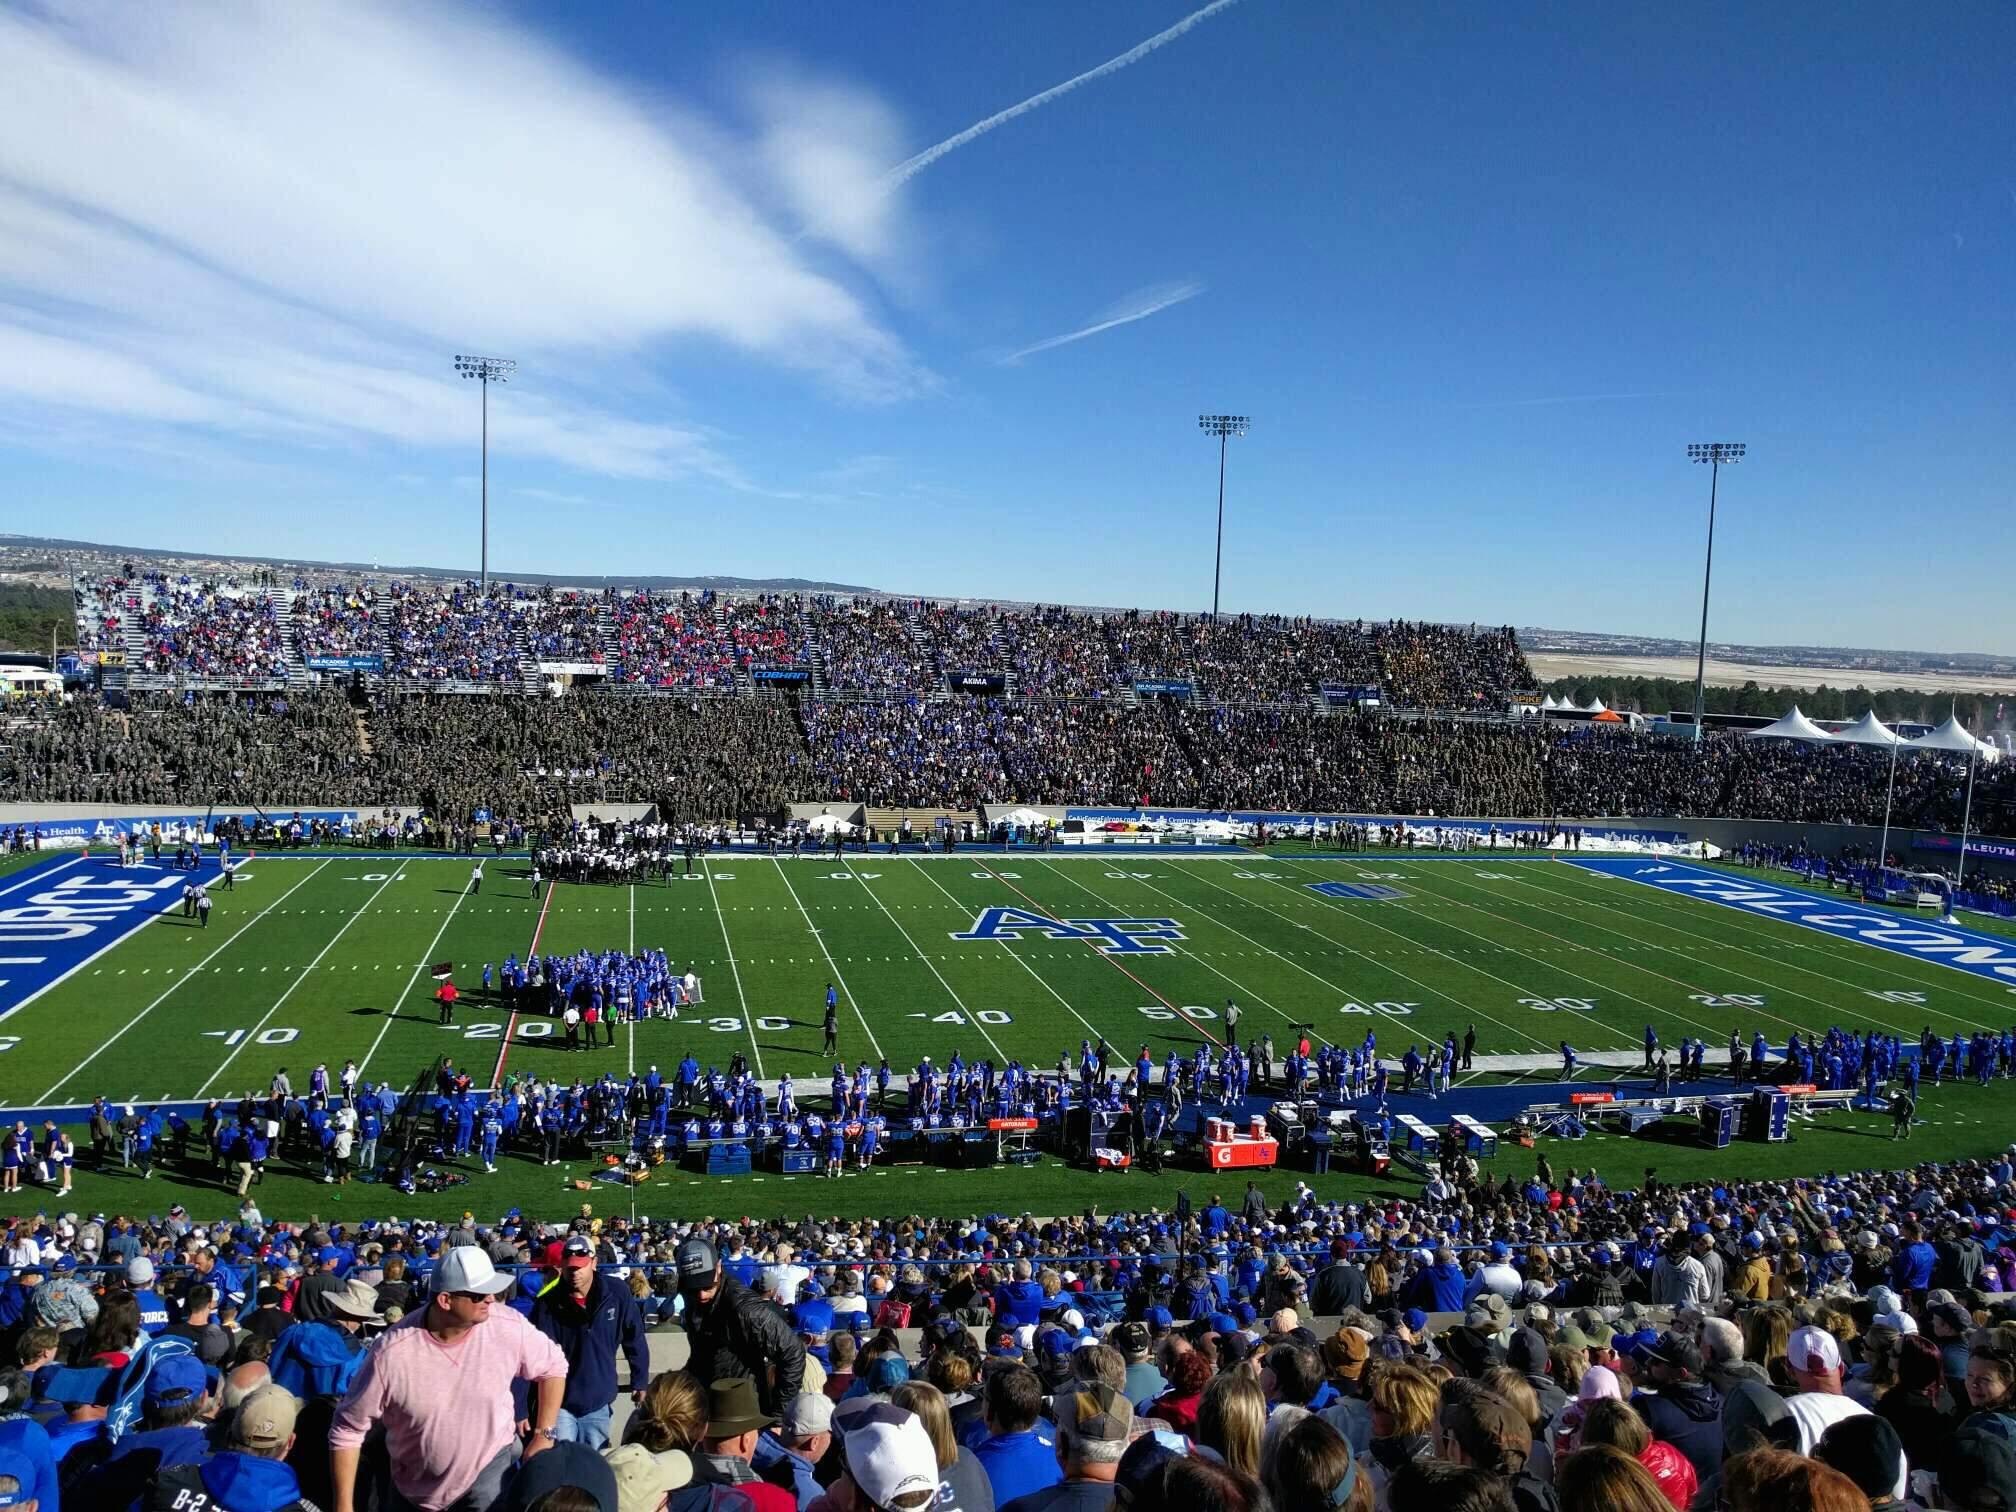 Falcon Stadium Section m9 Row t Seat 32